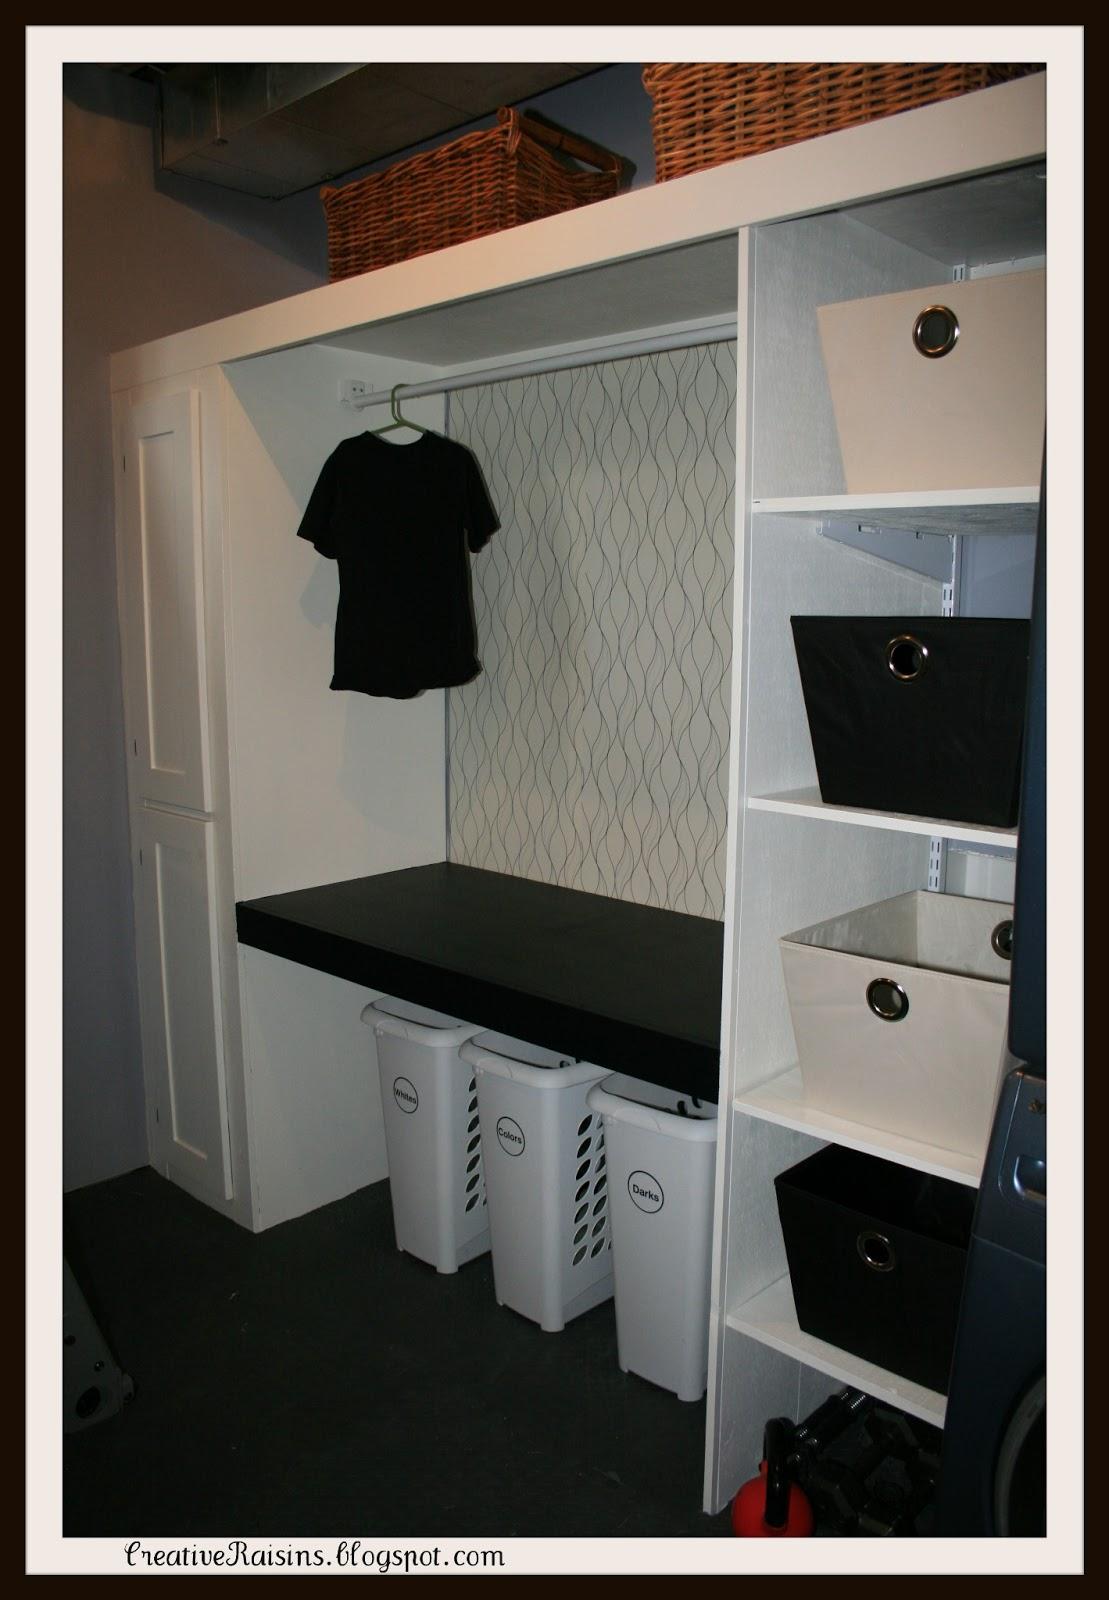 Creative Raisins Laundry Room Makeover